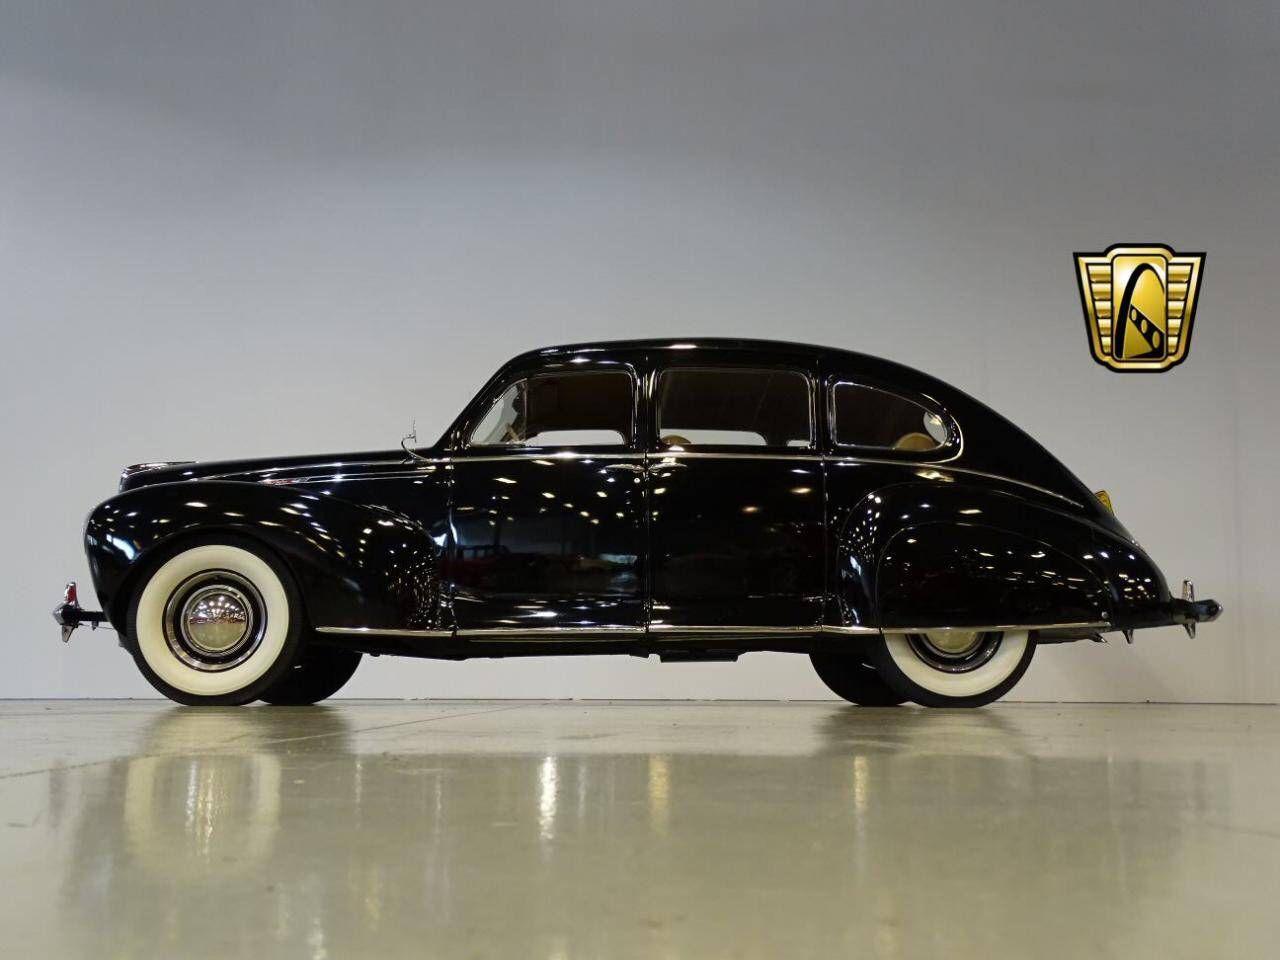 1940 Lincoln Zephyr sedan